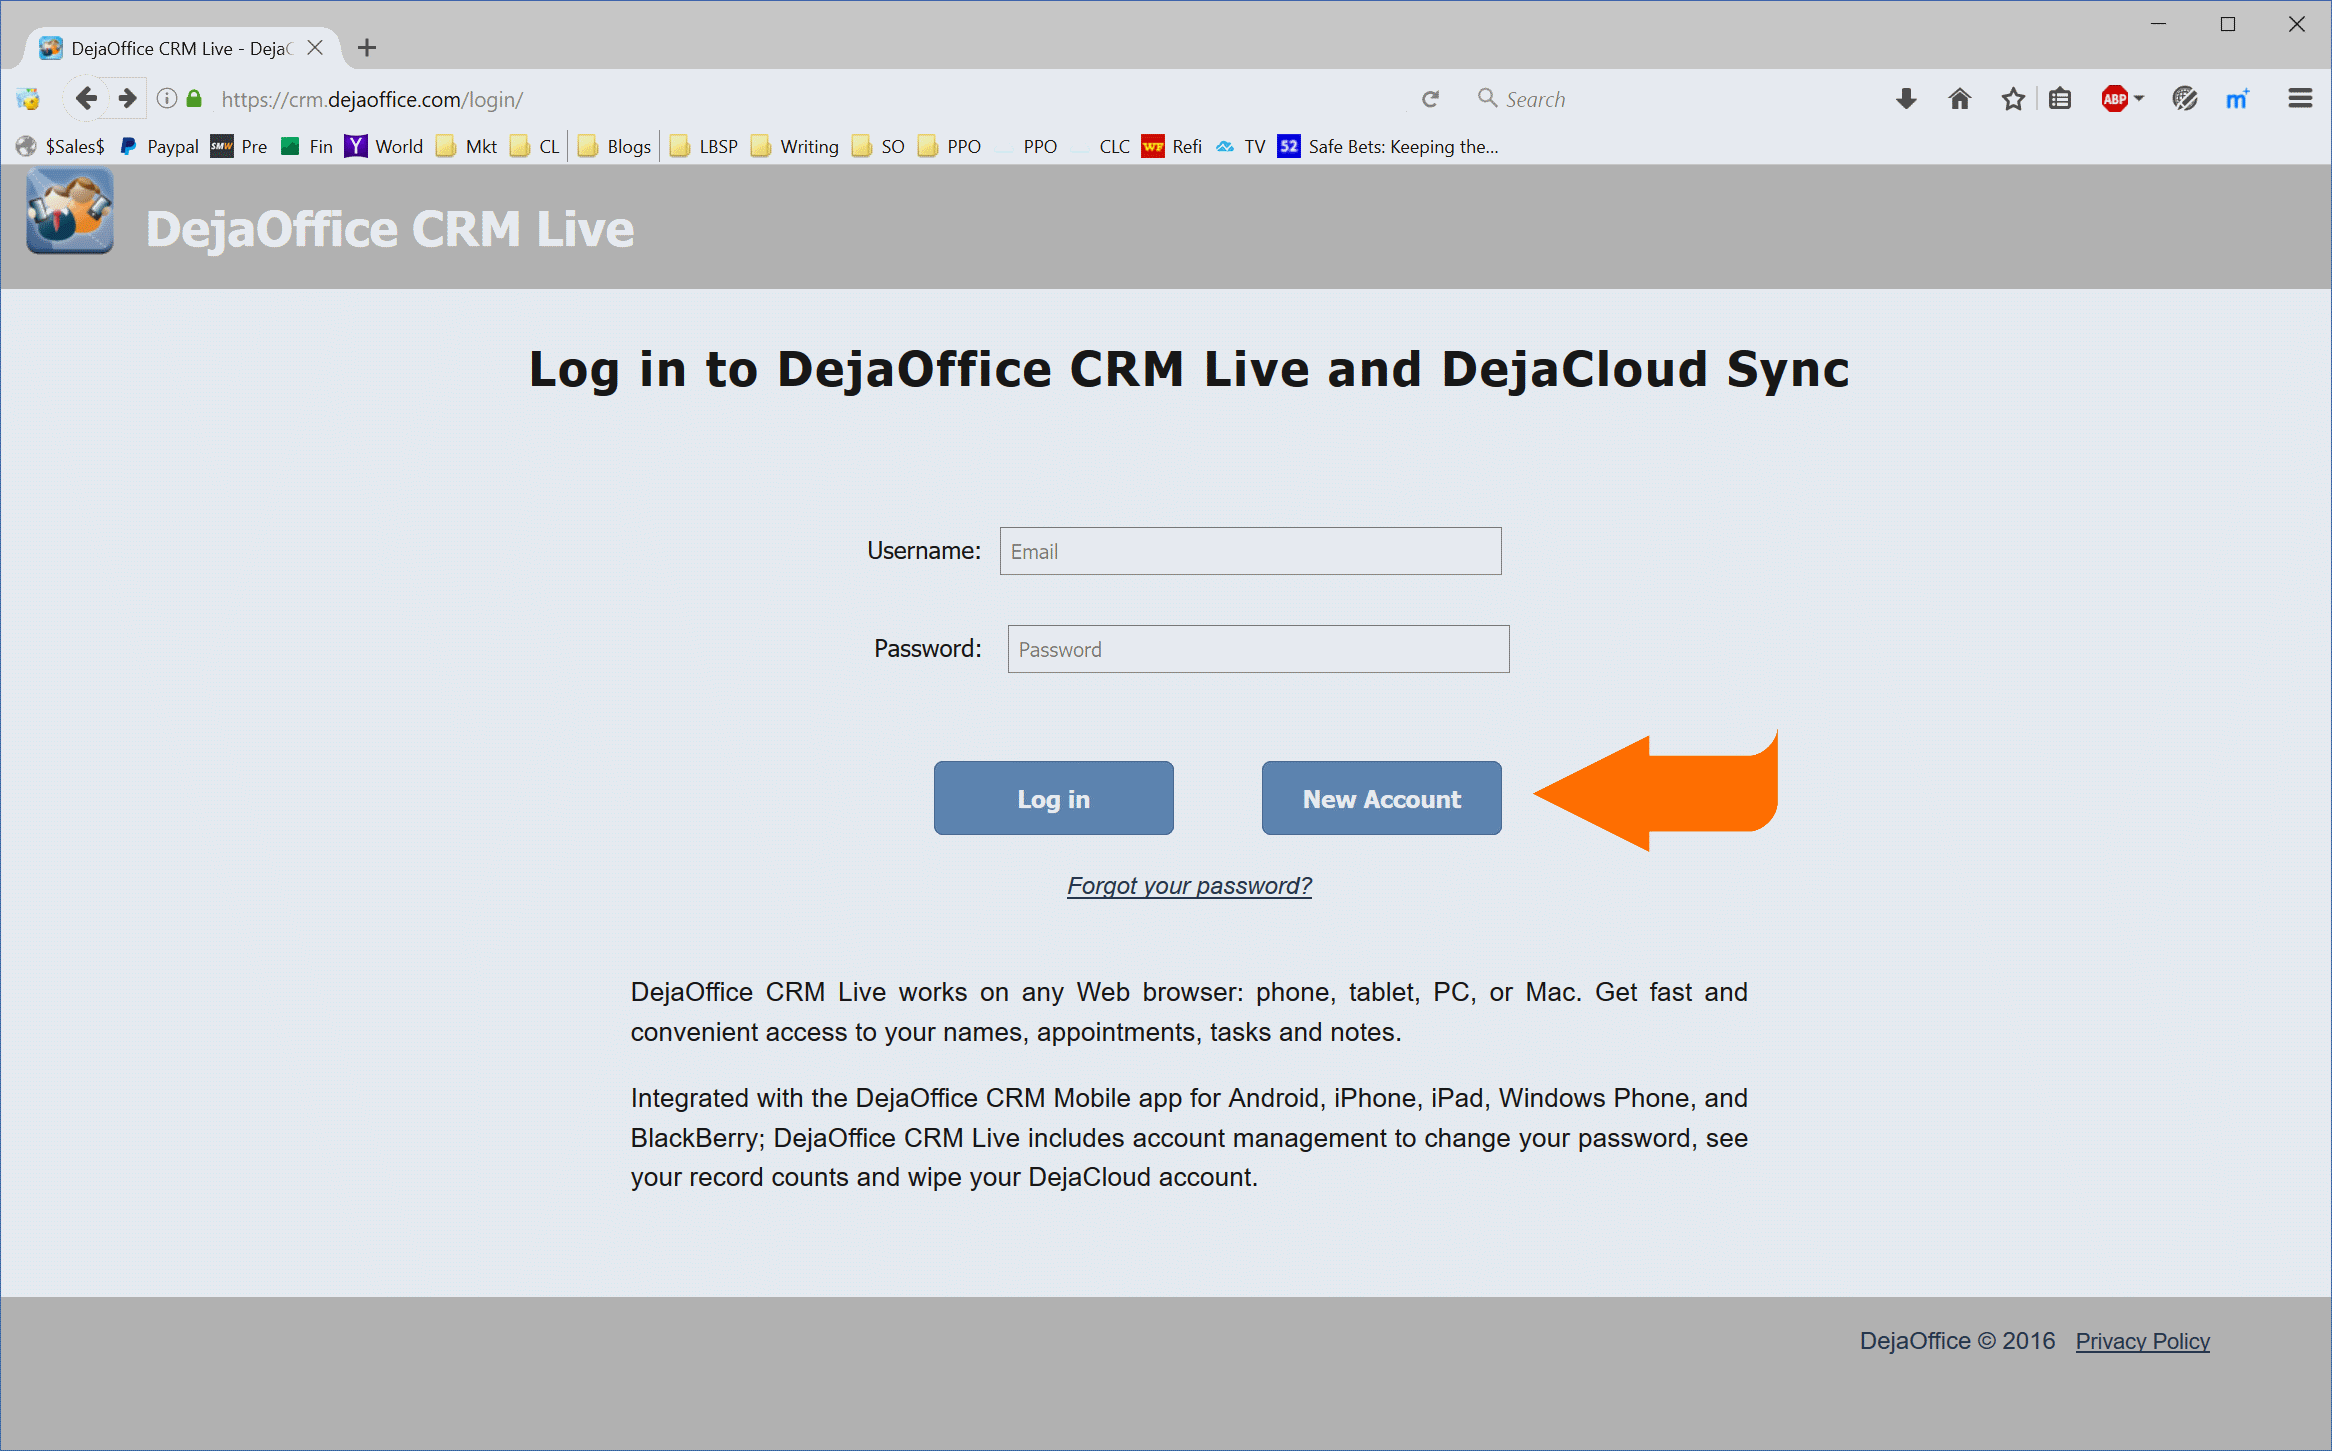 DejaOffice CRM Live Login